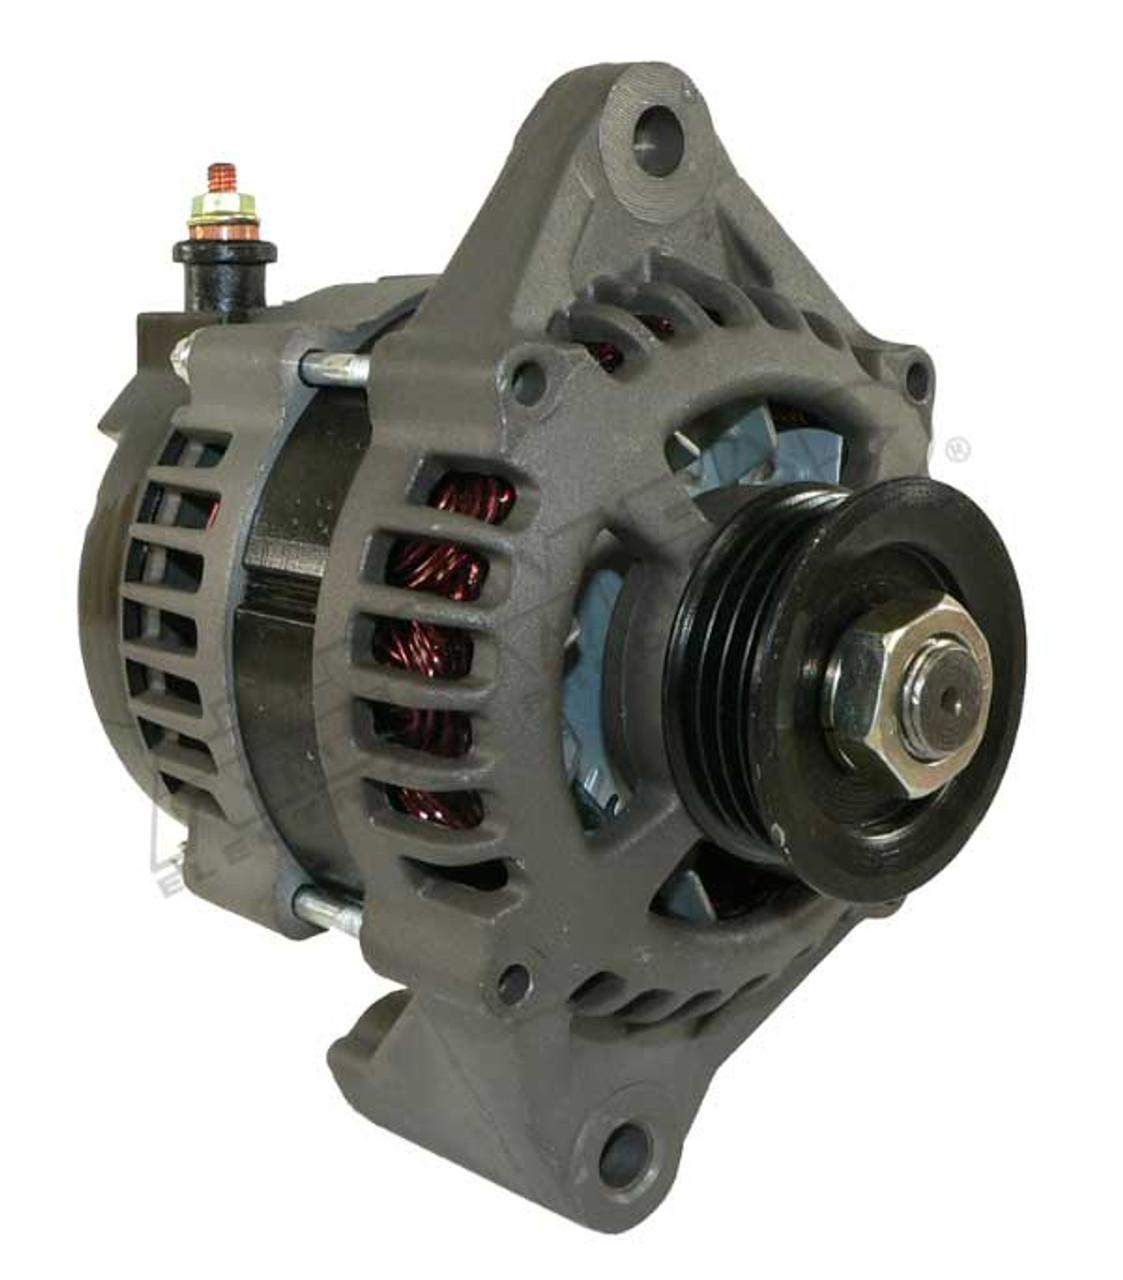 Alternator for 5SI Marine Applications IR/IF, 12-Volt, 50 Amp